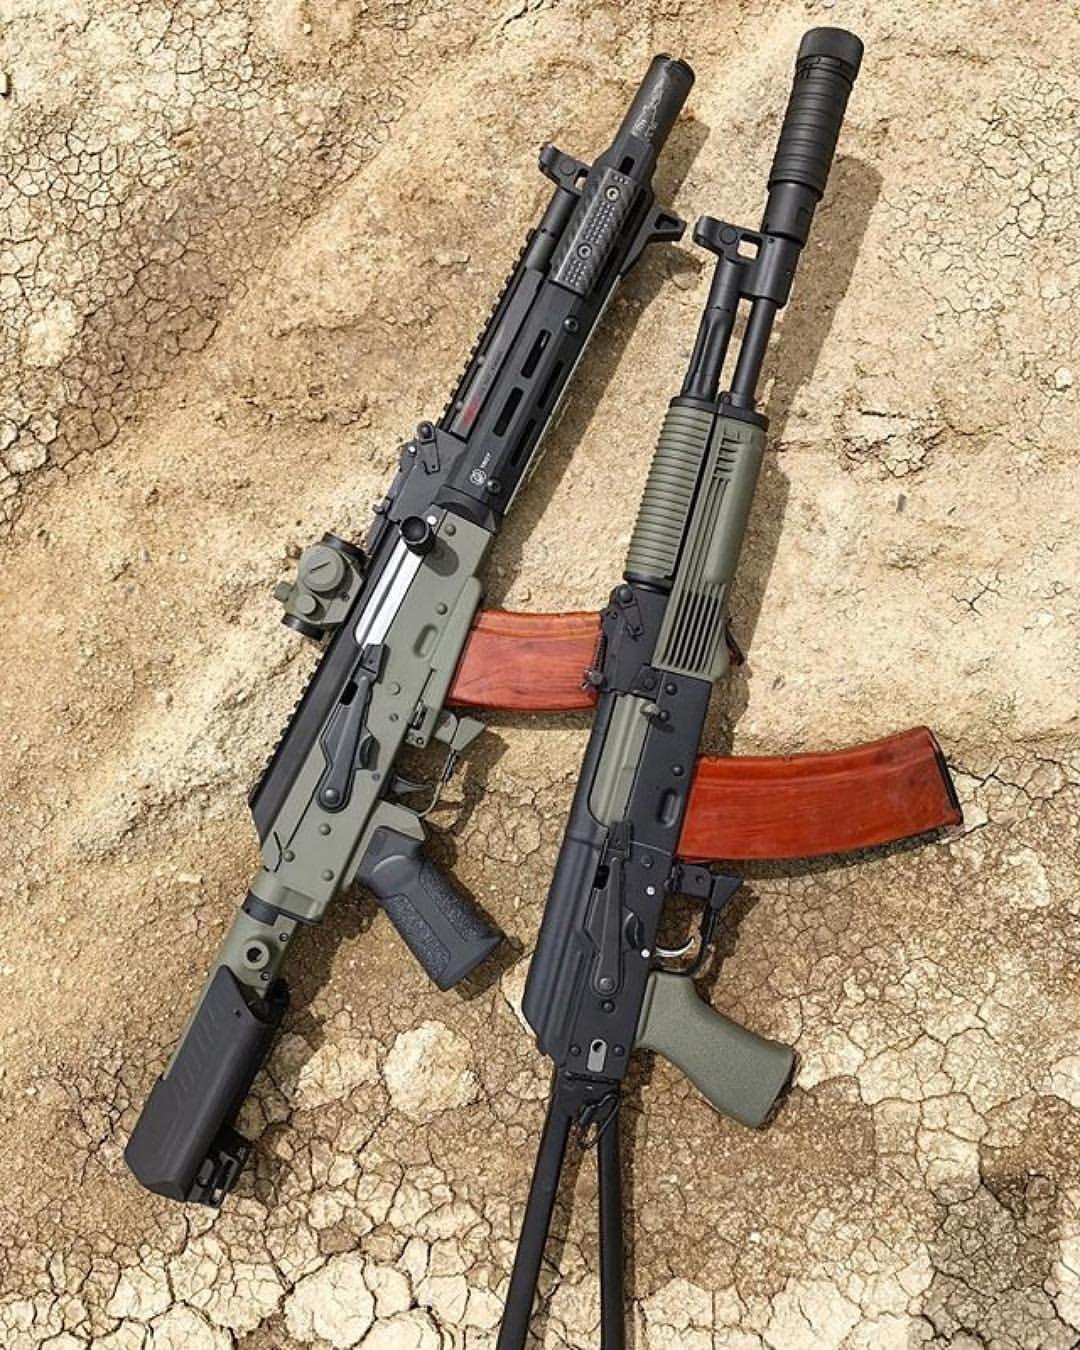 2 814 Likes 7 Comments Daily Custom Guns Dailycustomguns On Instagram By Bgonz 5 45 The Green Guns Tactical Guns And Ammo Shooting Guns